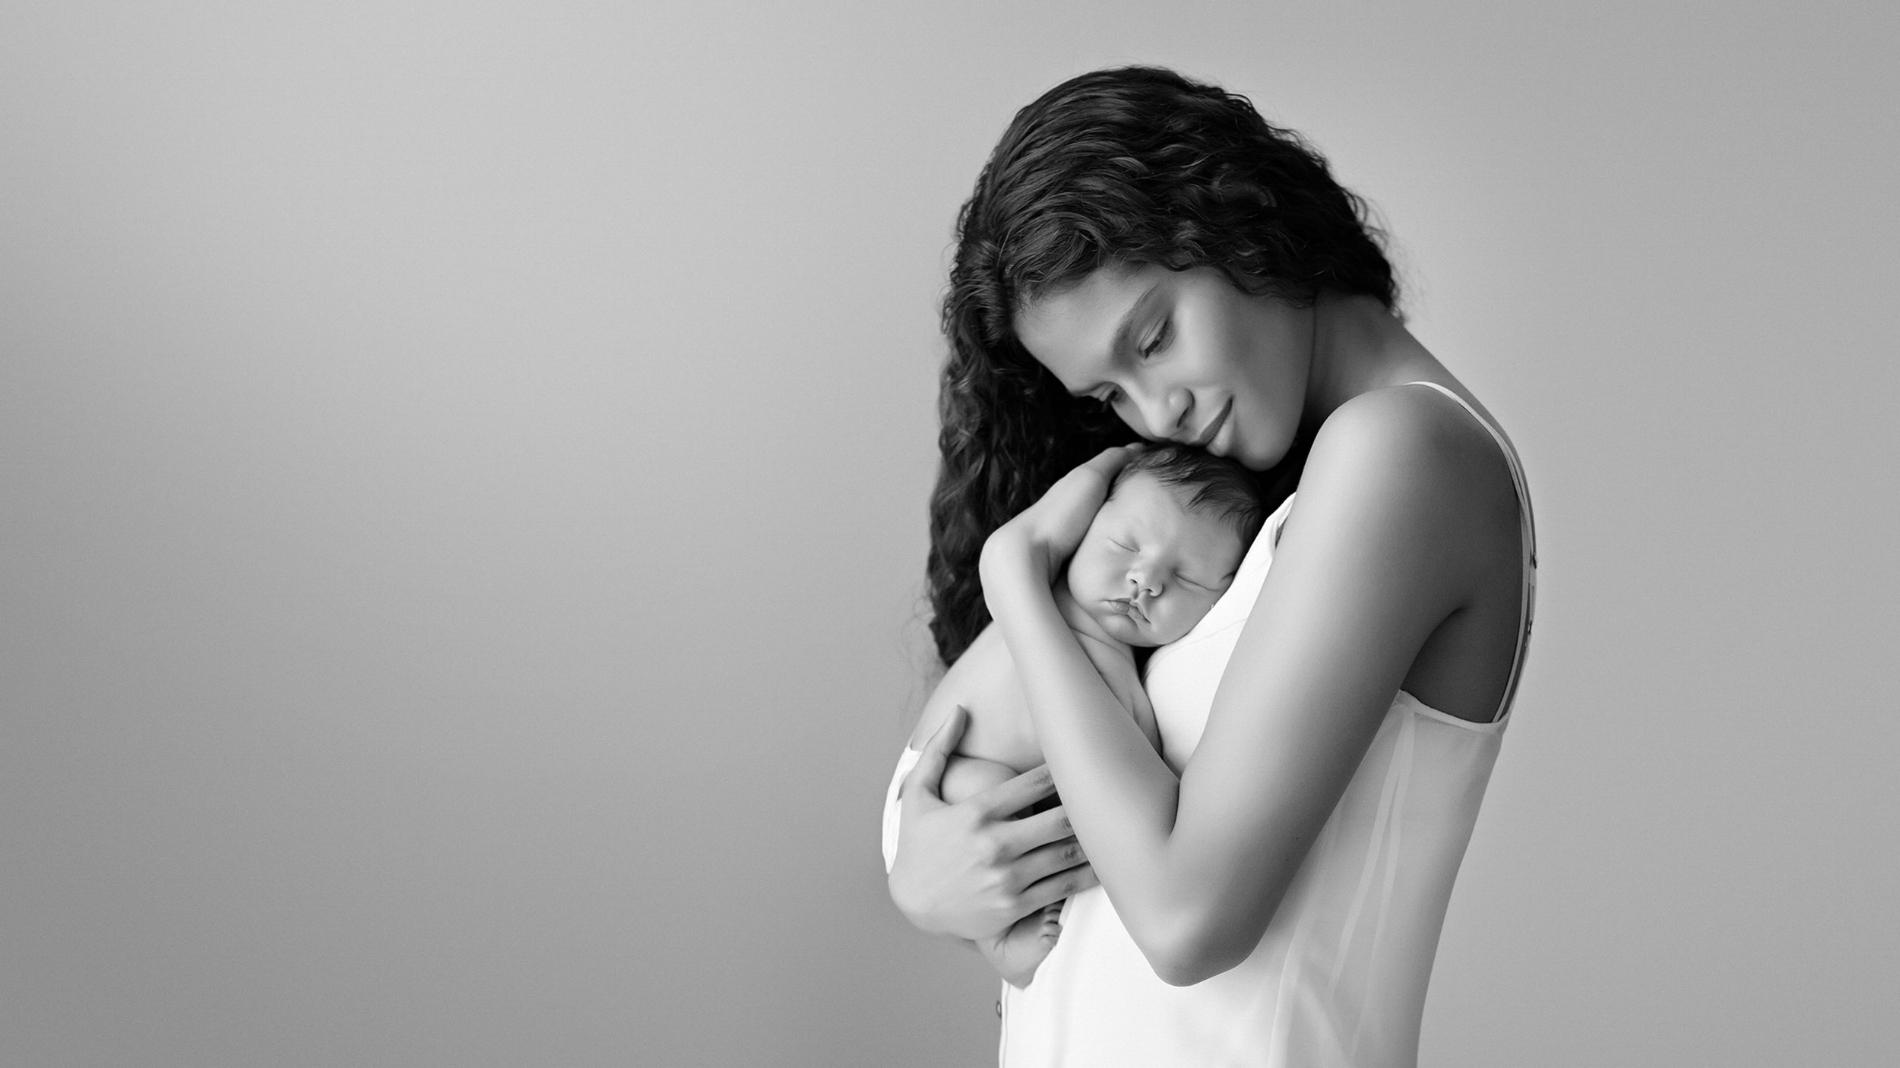 Artistic newborn photos